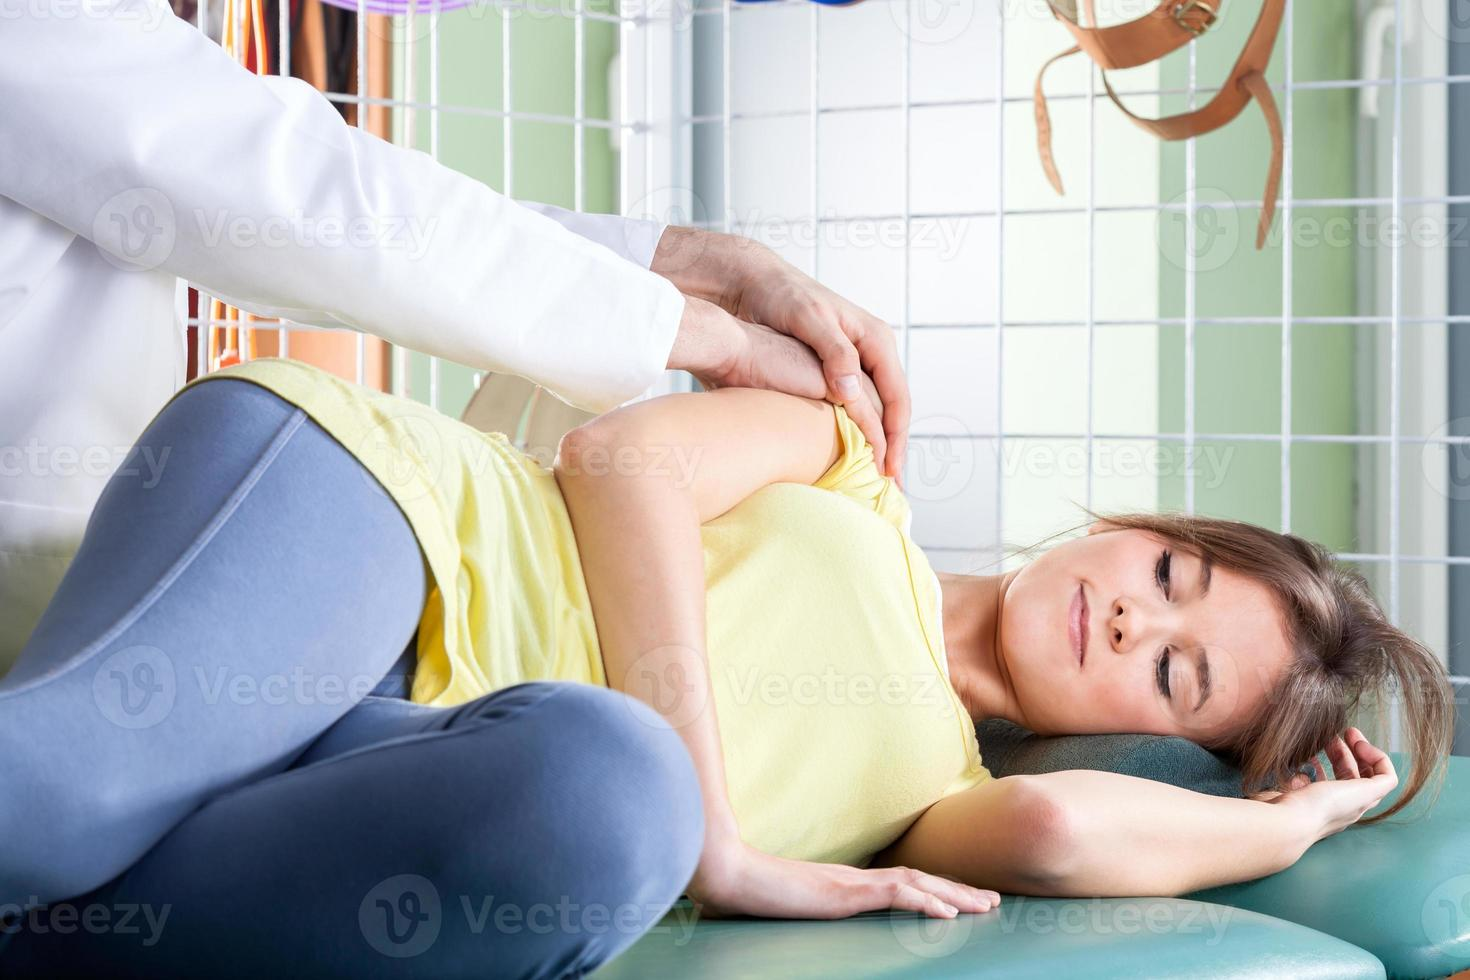 fisioterapeuta masajeando el brazo del paciente foto